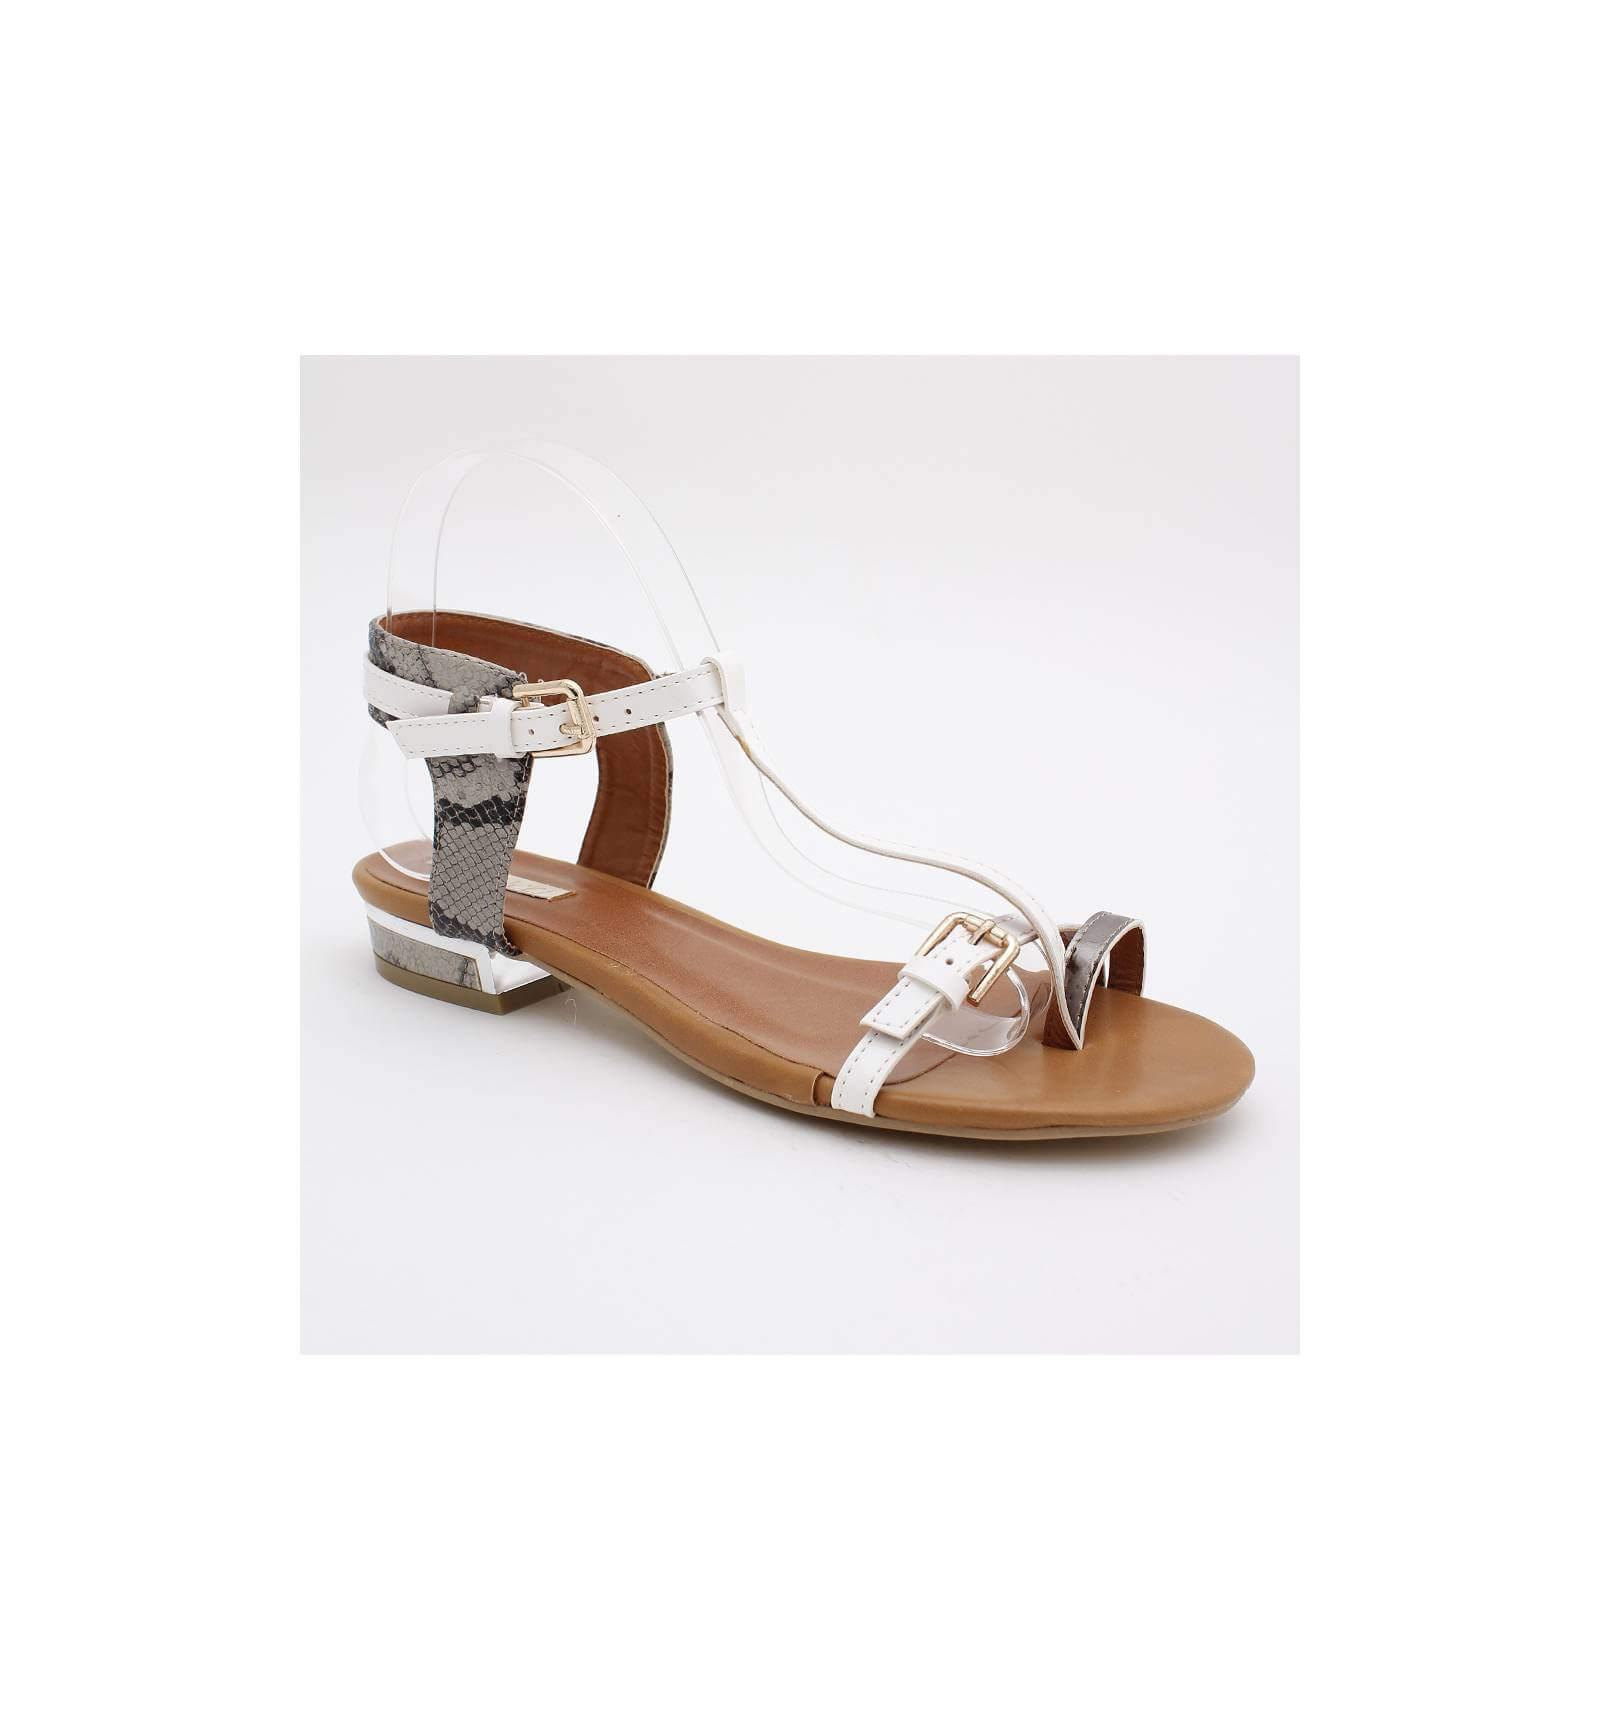 sandale femme blanc talon m tal mode. Black Bedroom Furniture Sets. Home Design Ideas